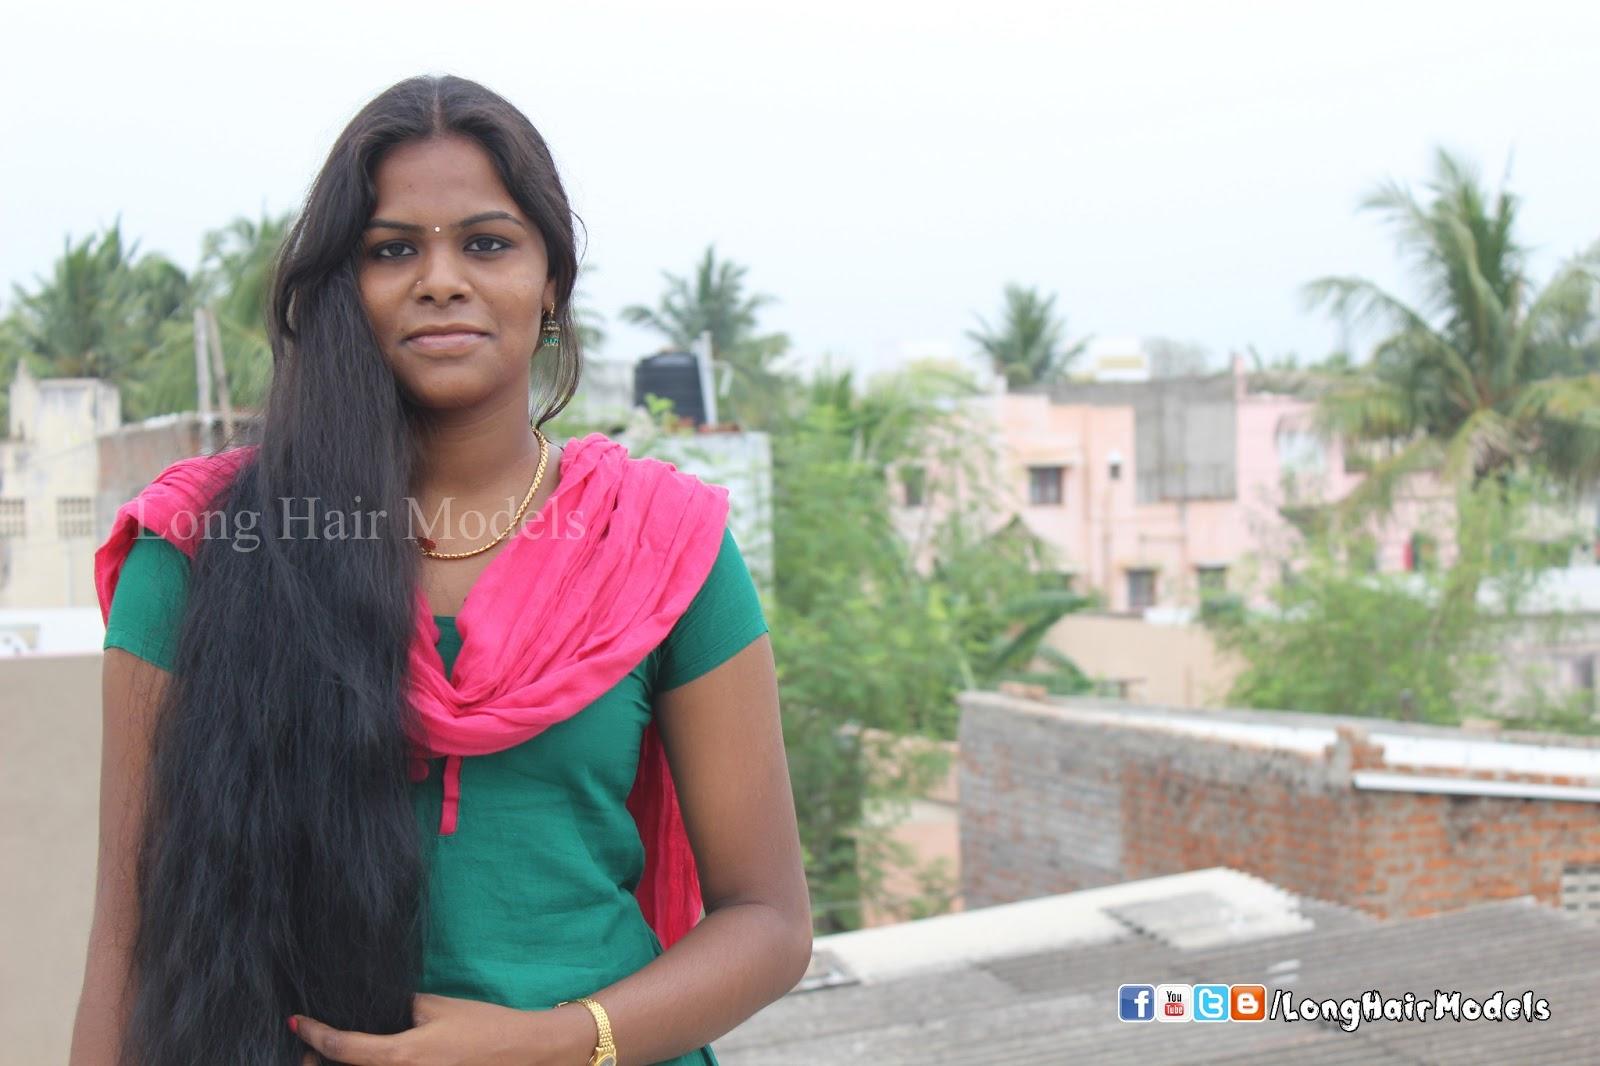 HAIR CARES Amp STYLES MODEL SUNDARI LONG HAIR MODELS